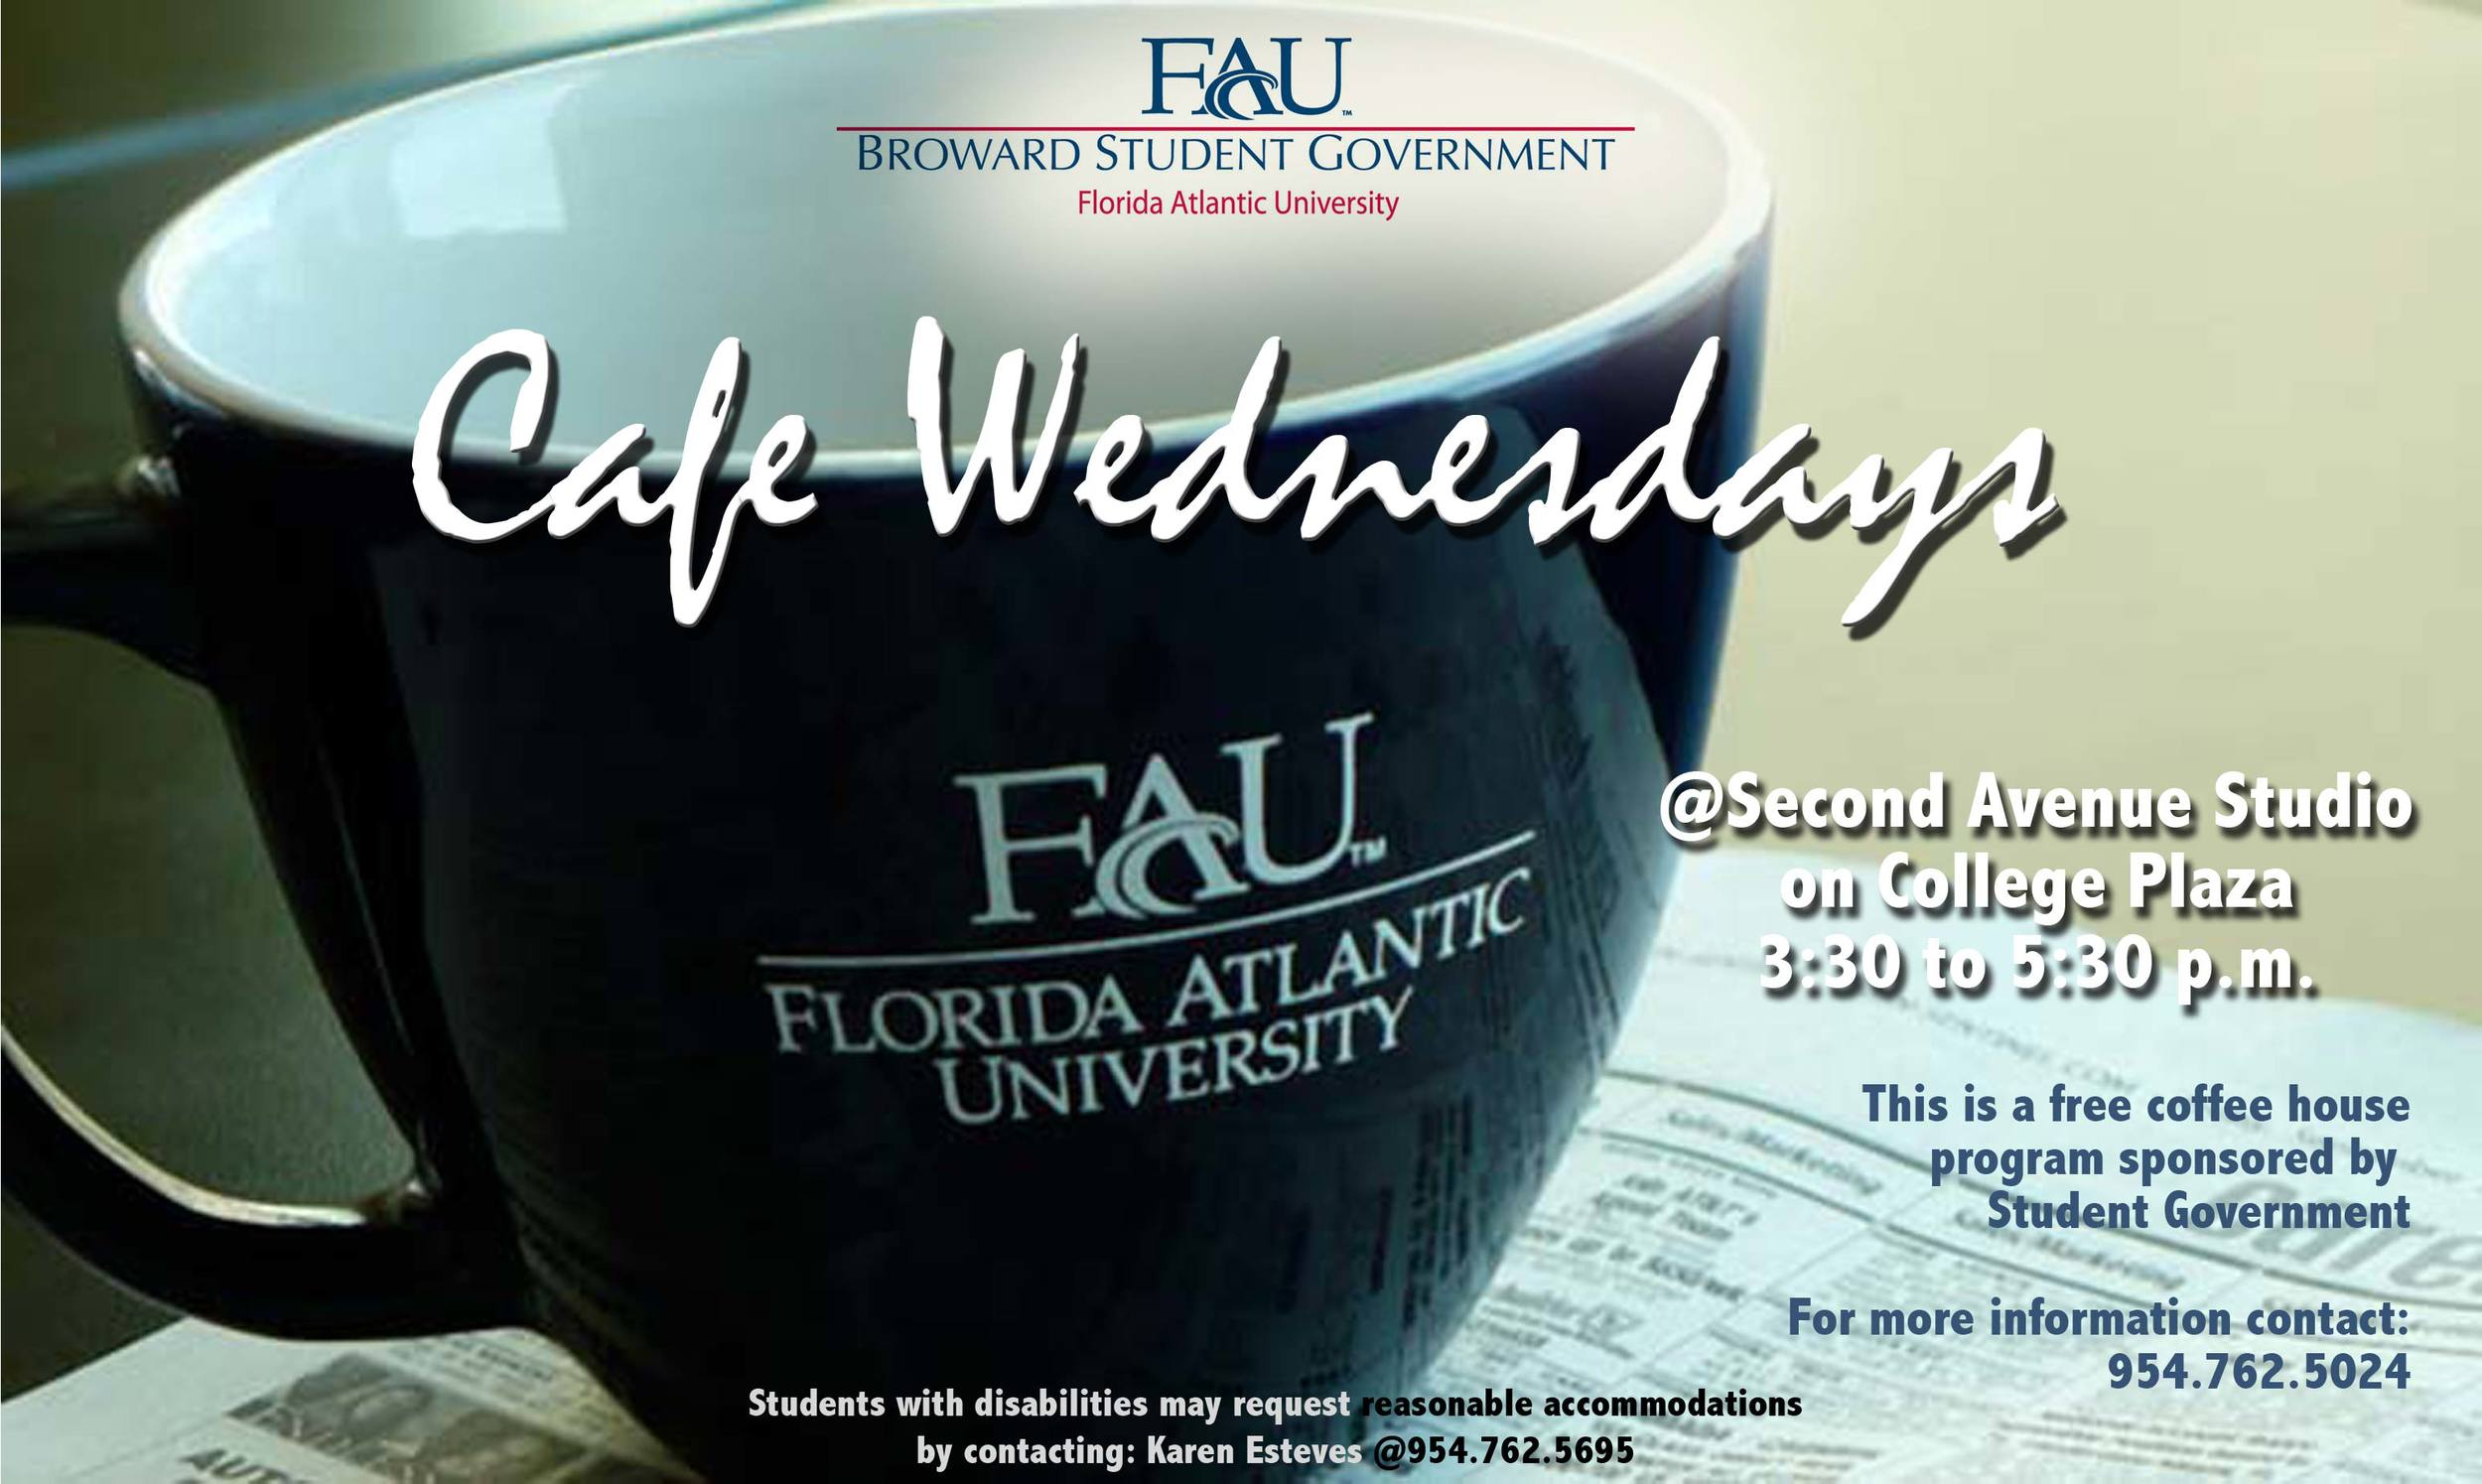 Cafe'-Wednesdays-Fall-2011.jpg